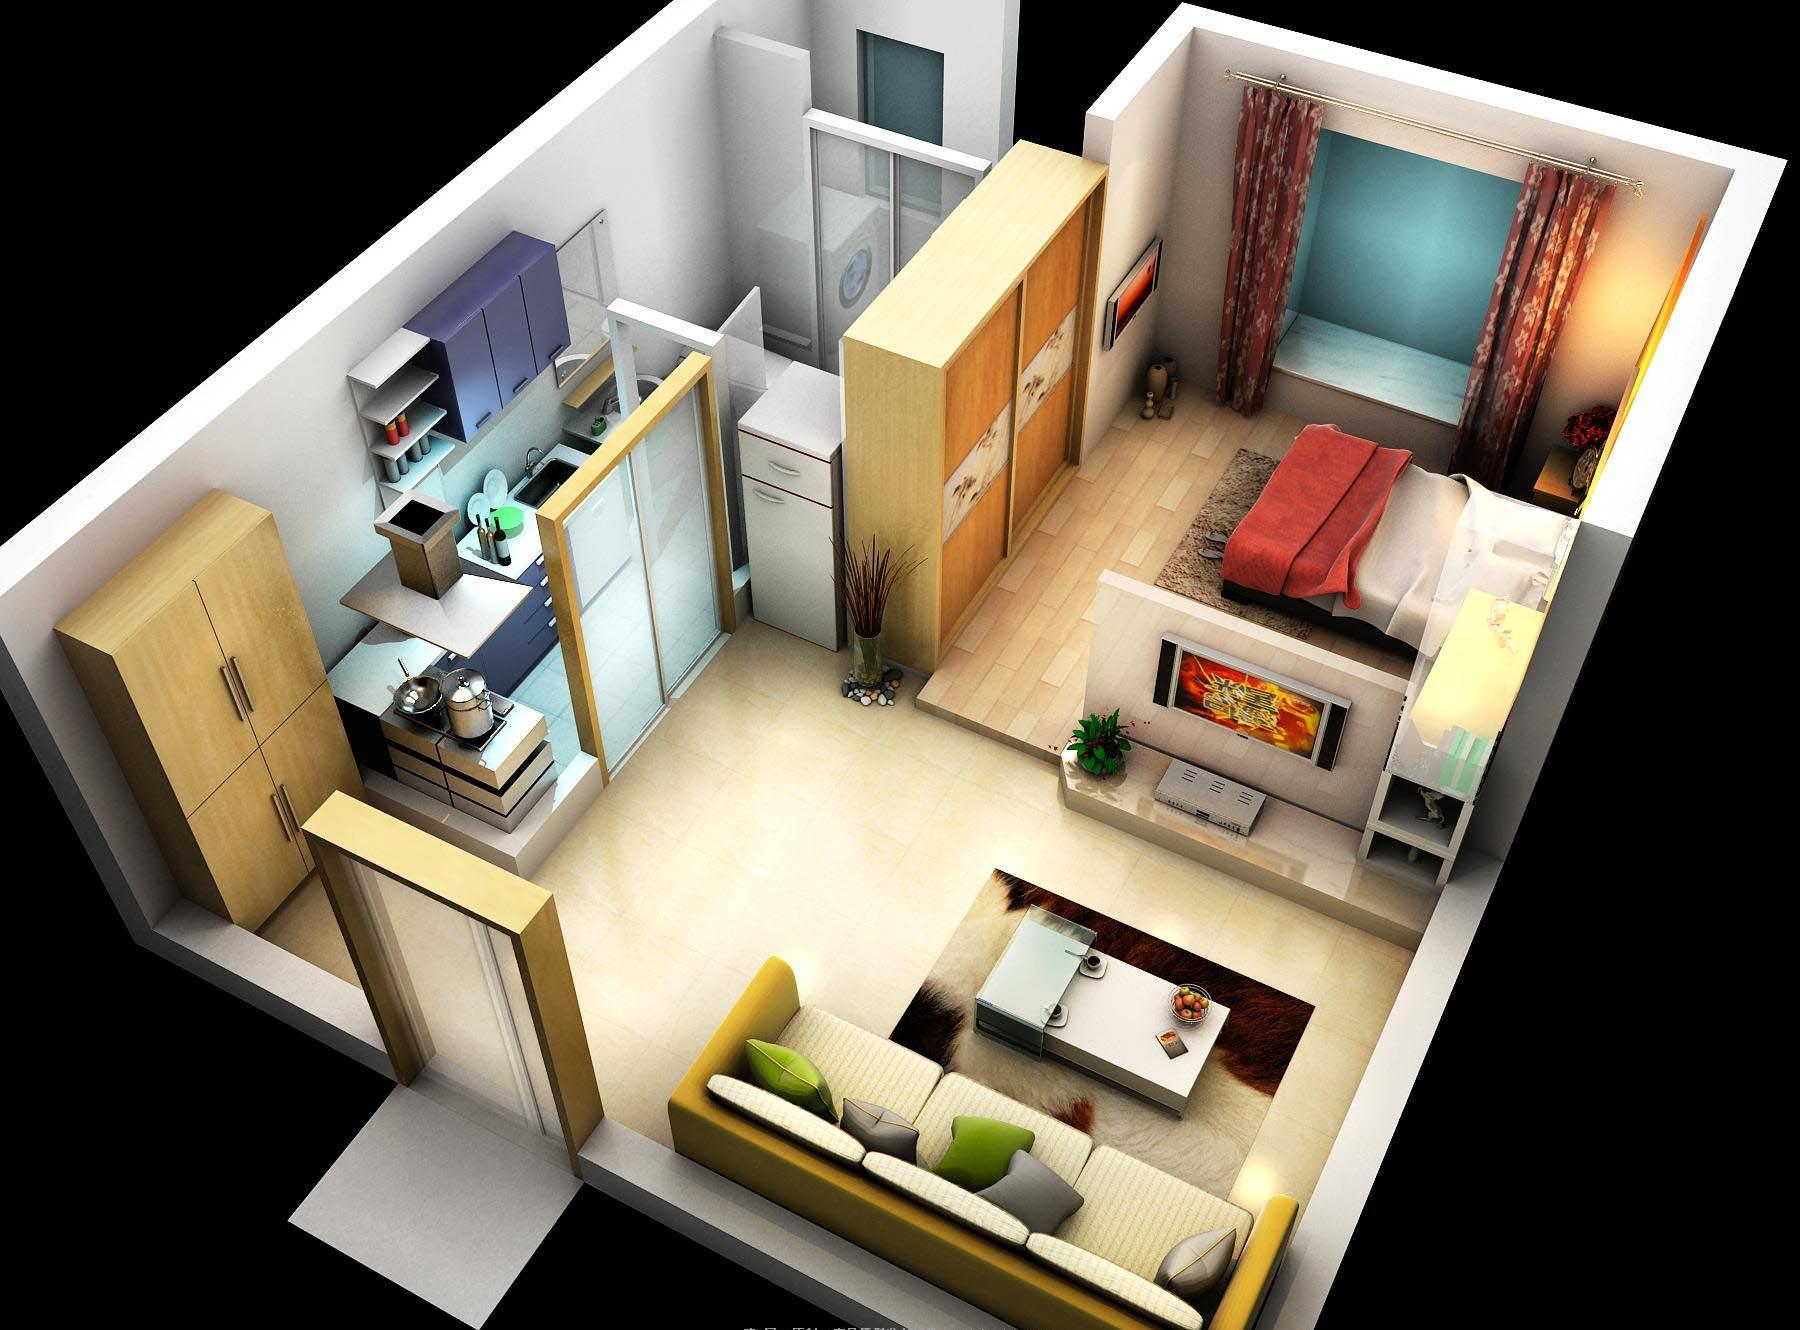 dzīvoklis 001 3d modelis max 120613